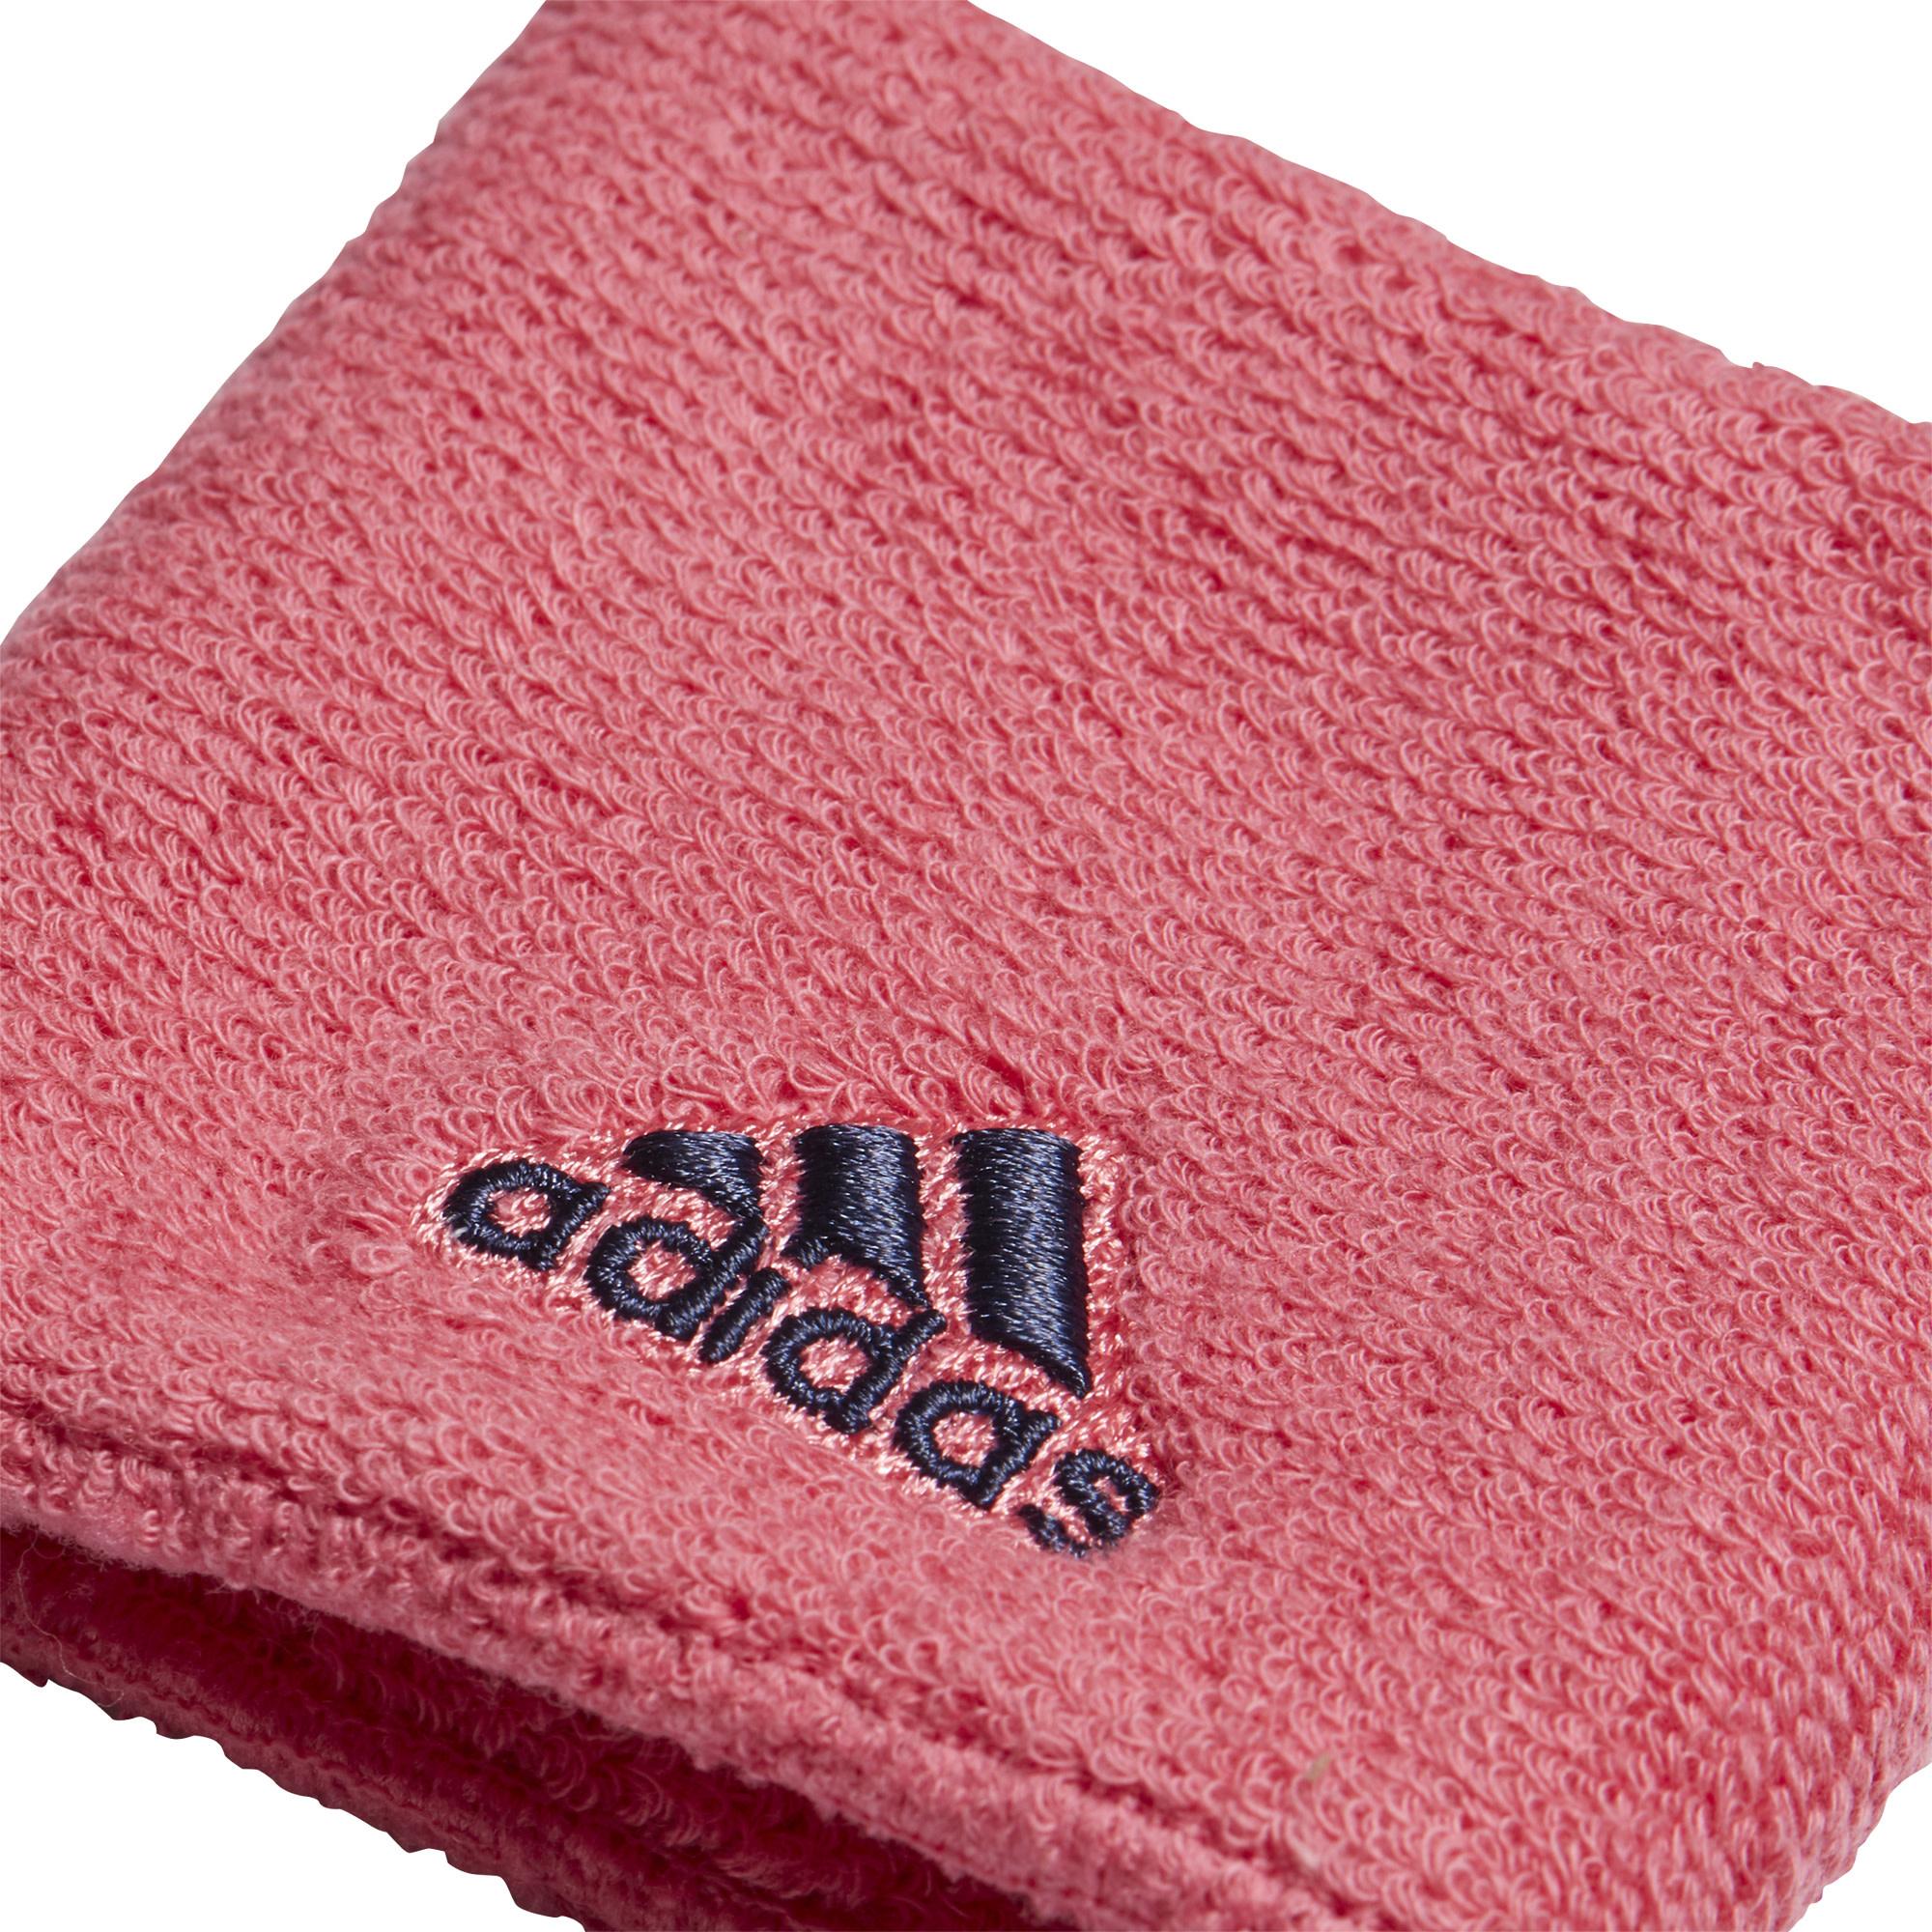 Adidas ADIDAS Real Madrid Wristband